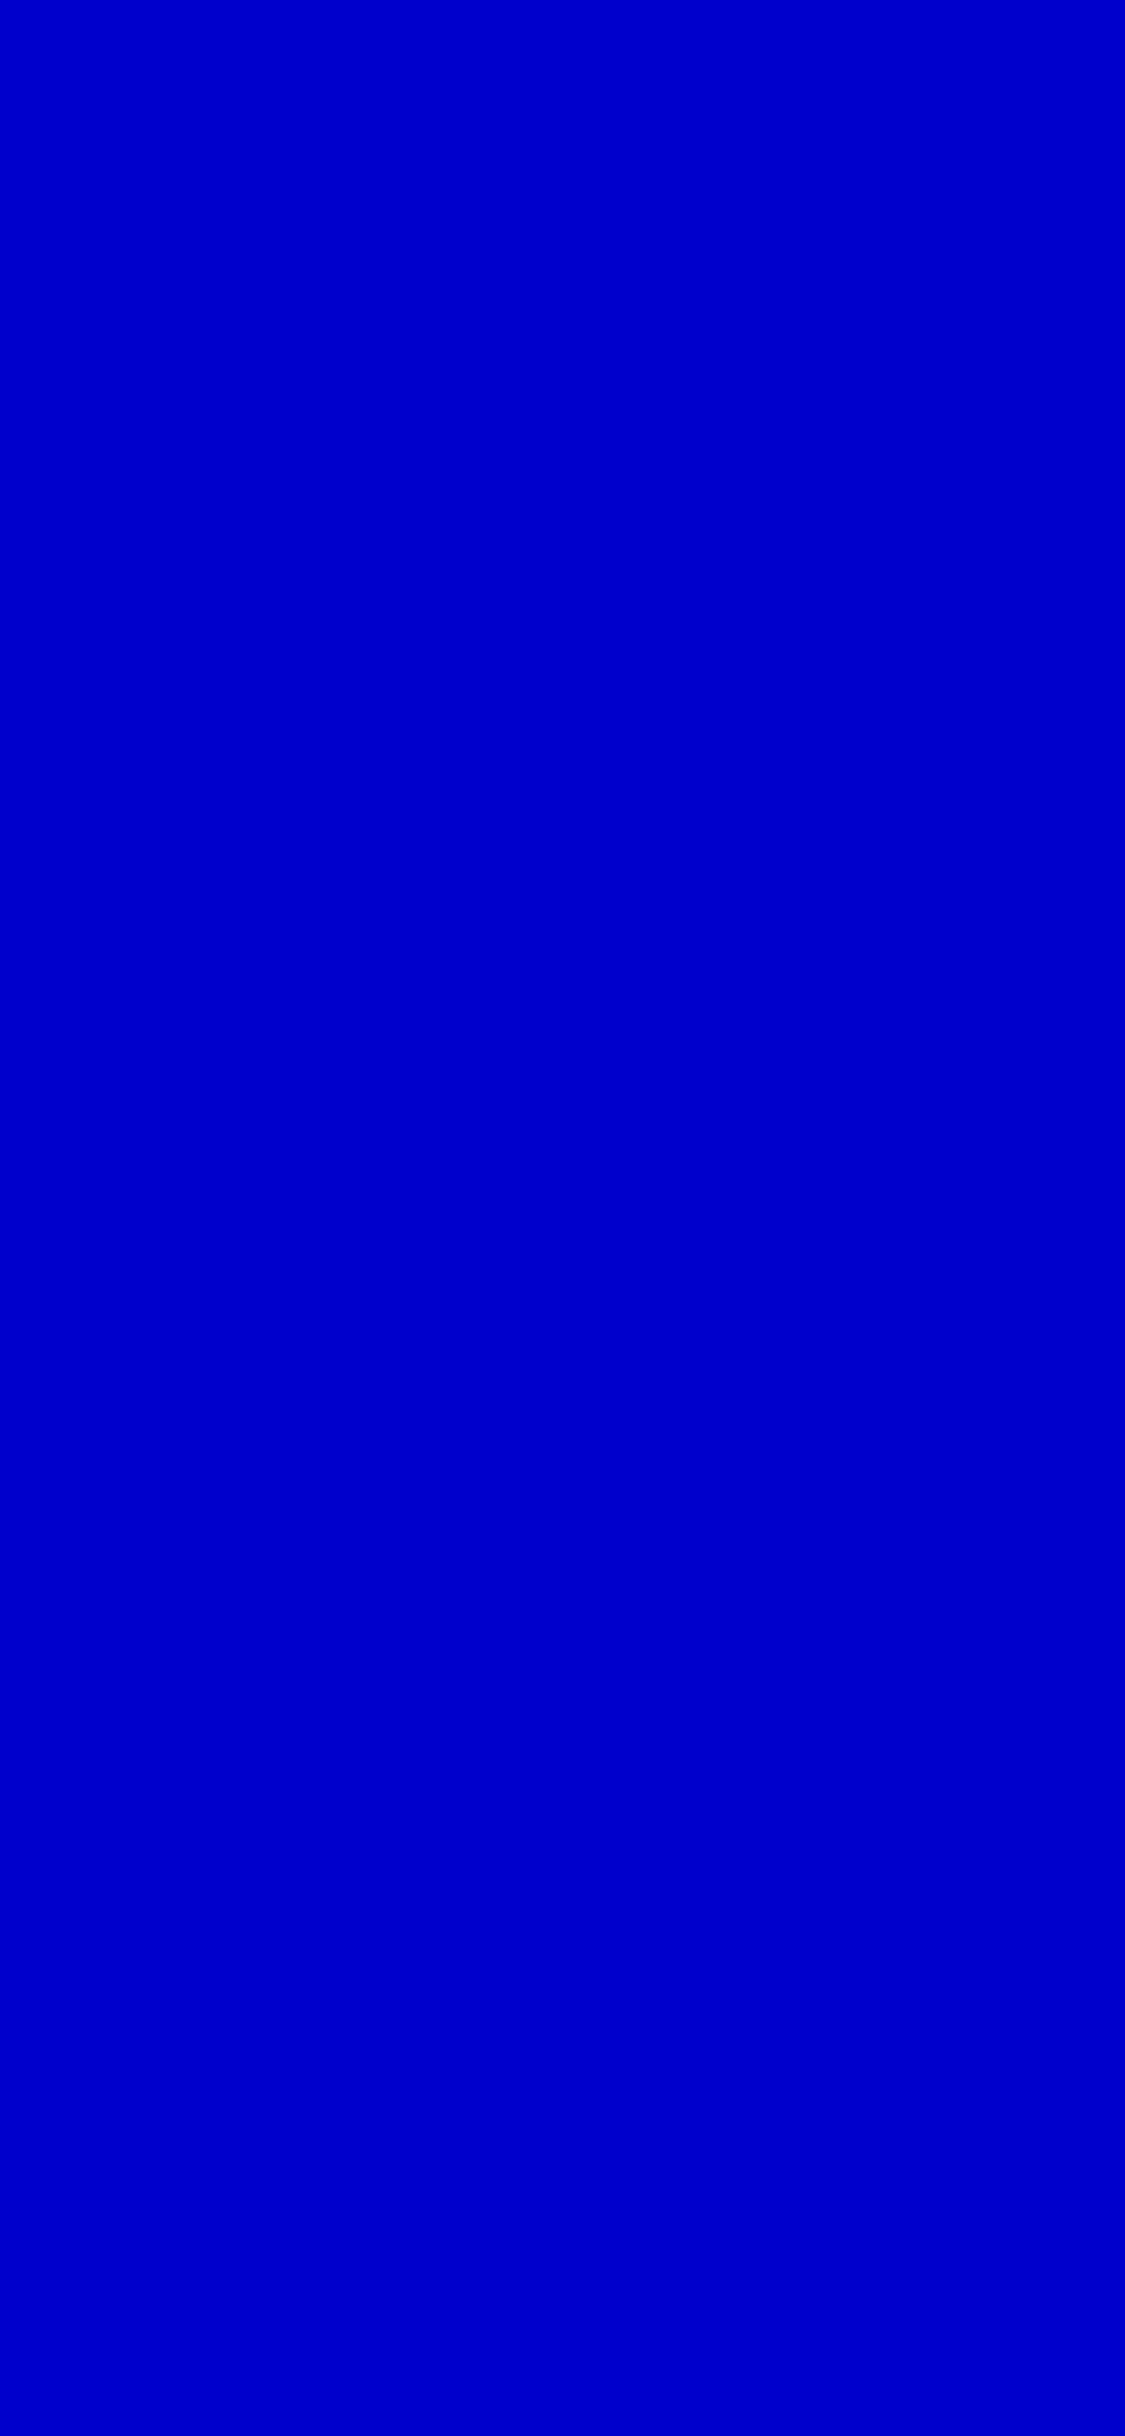 1125x2436 Medium Blue Solid Color Background